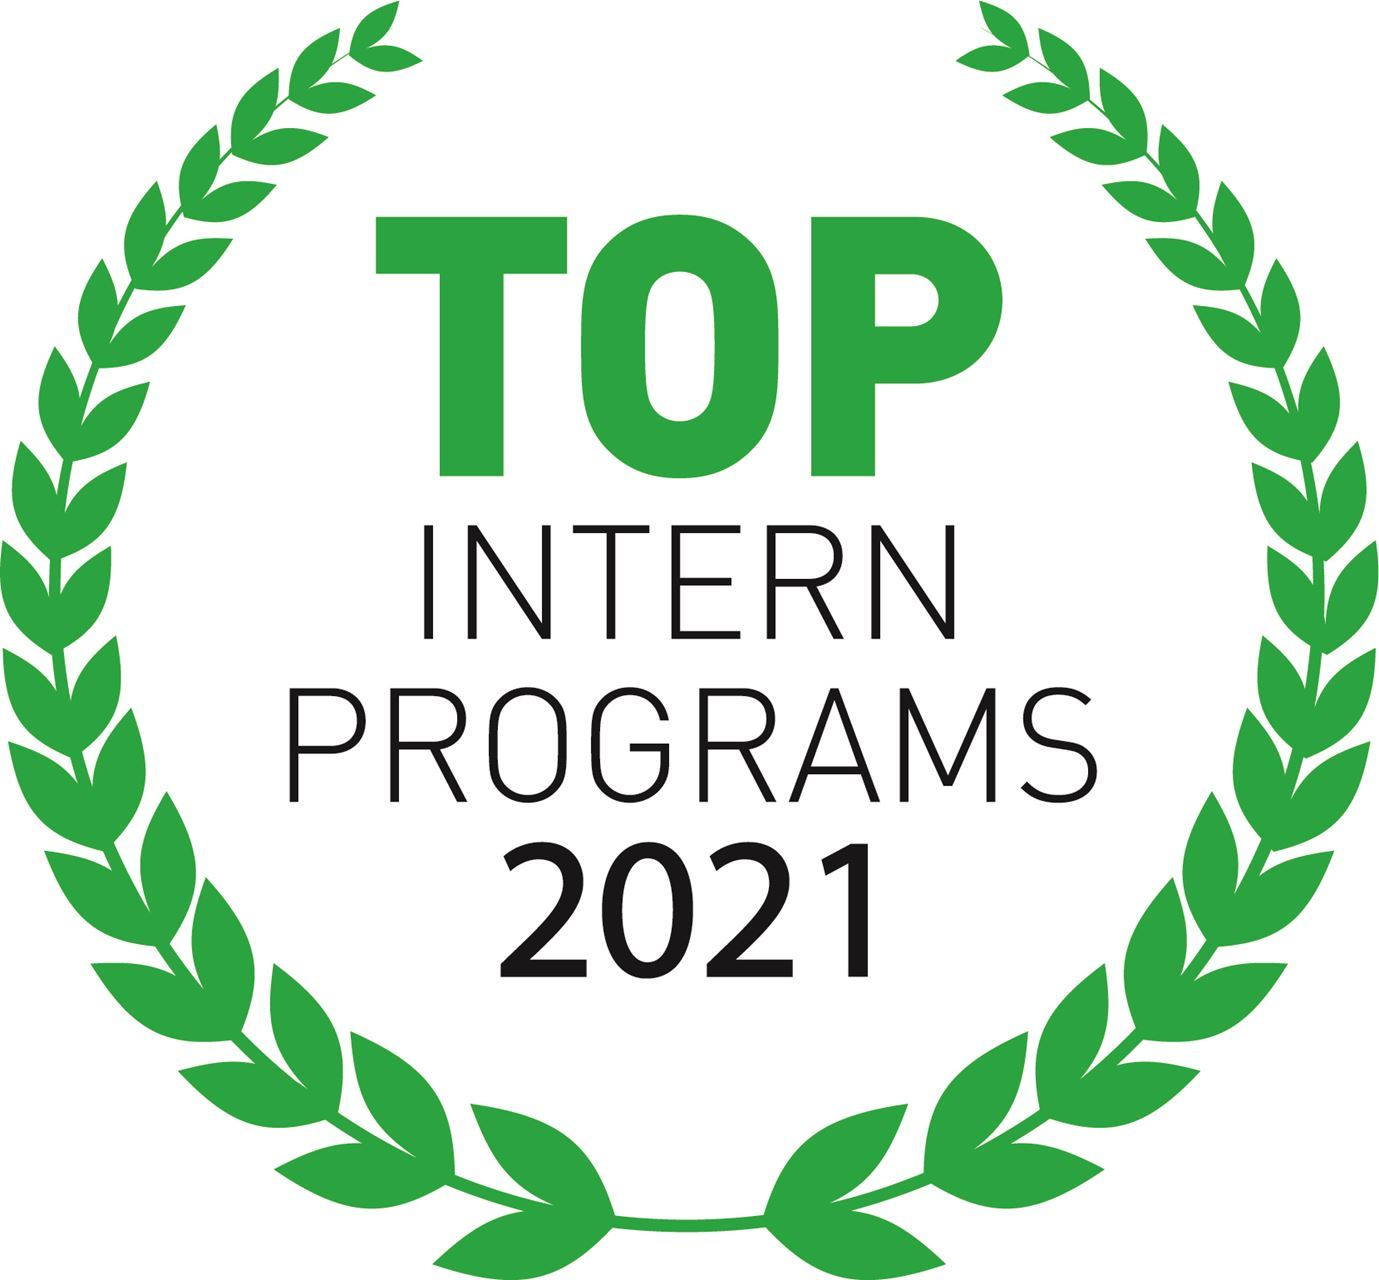 Top Intern Programs